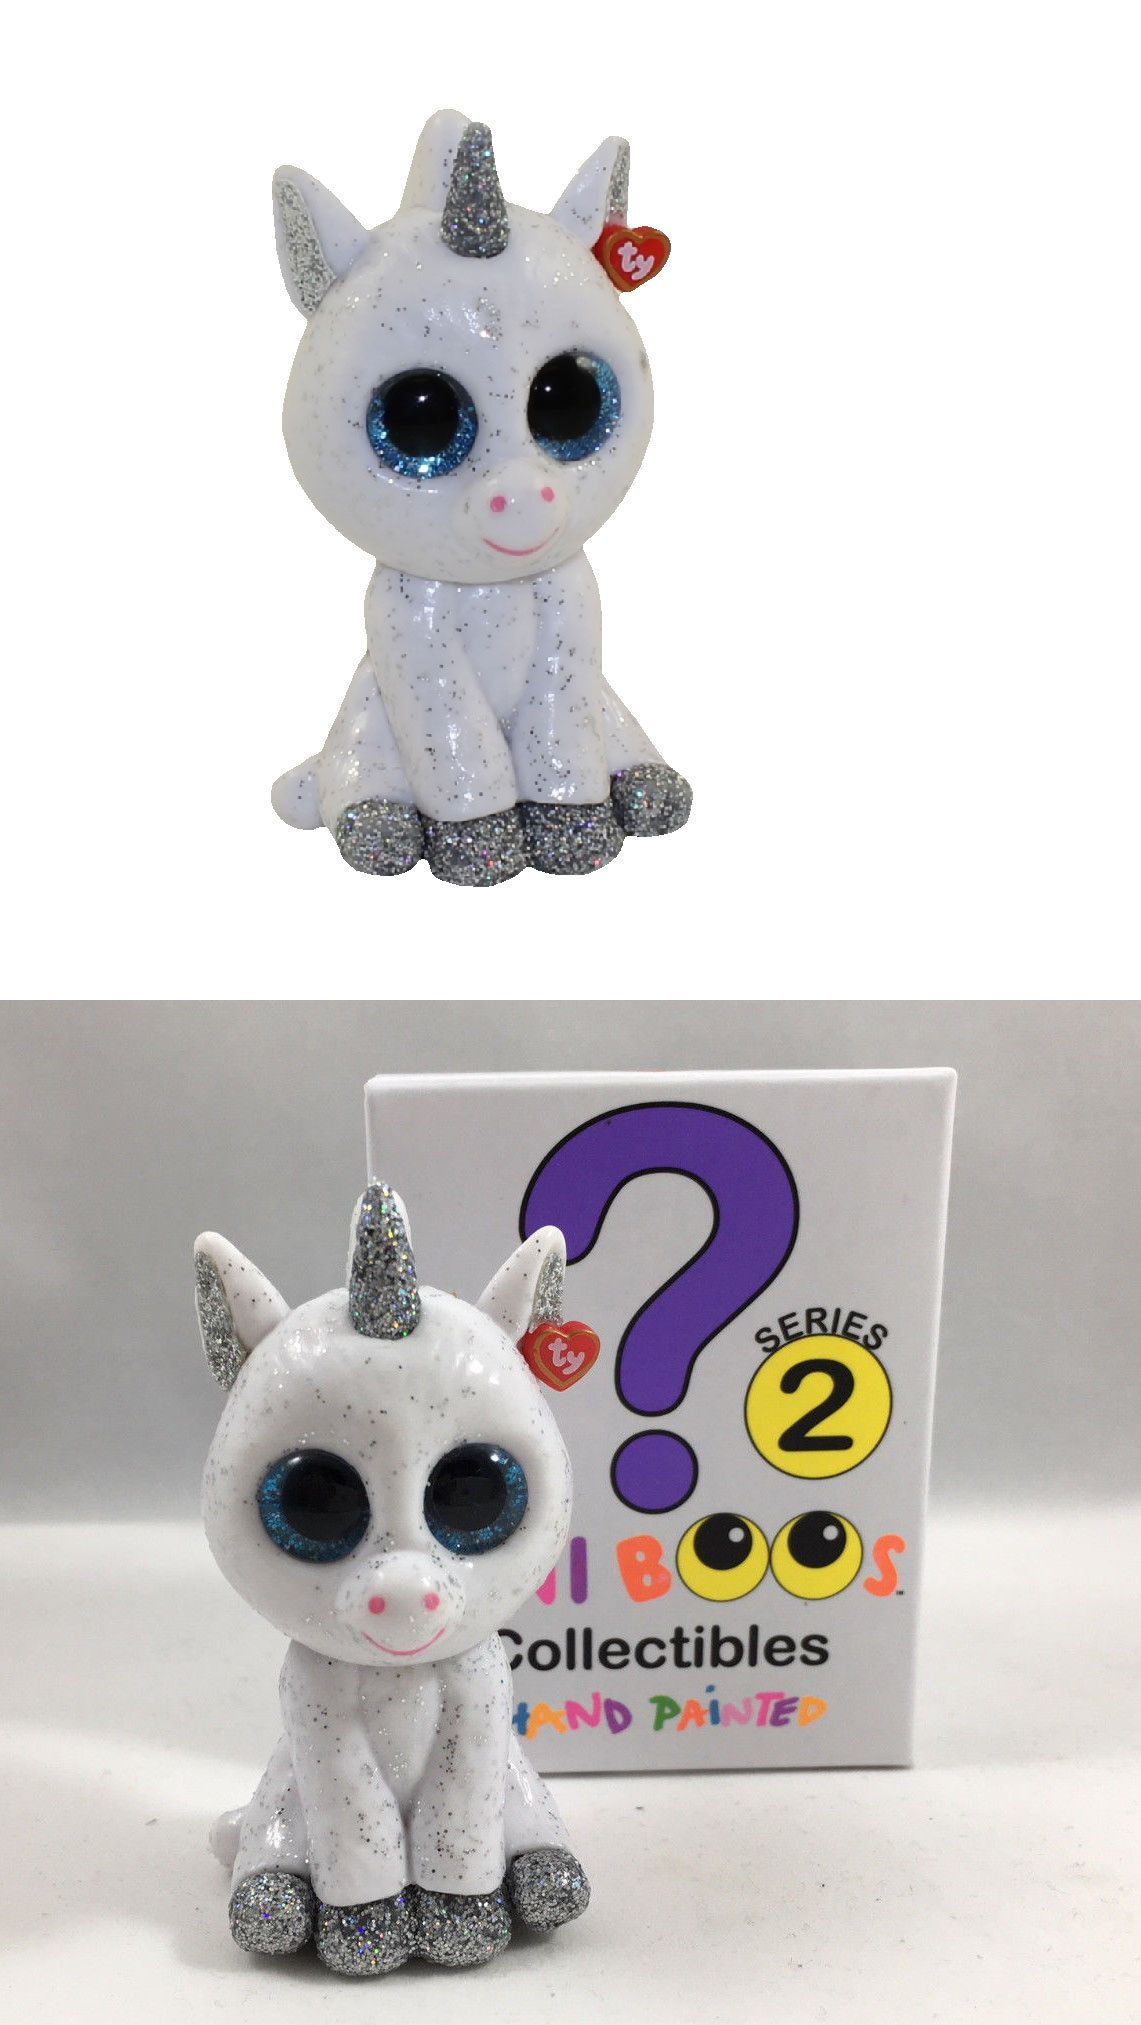 2 inch TY Beanie Boos Mini Boo SERIES 2 Collectible Figure GLITTER the Unicorn